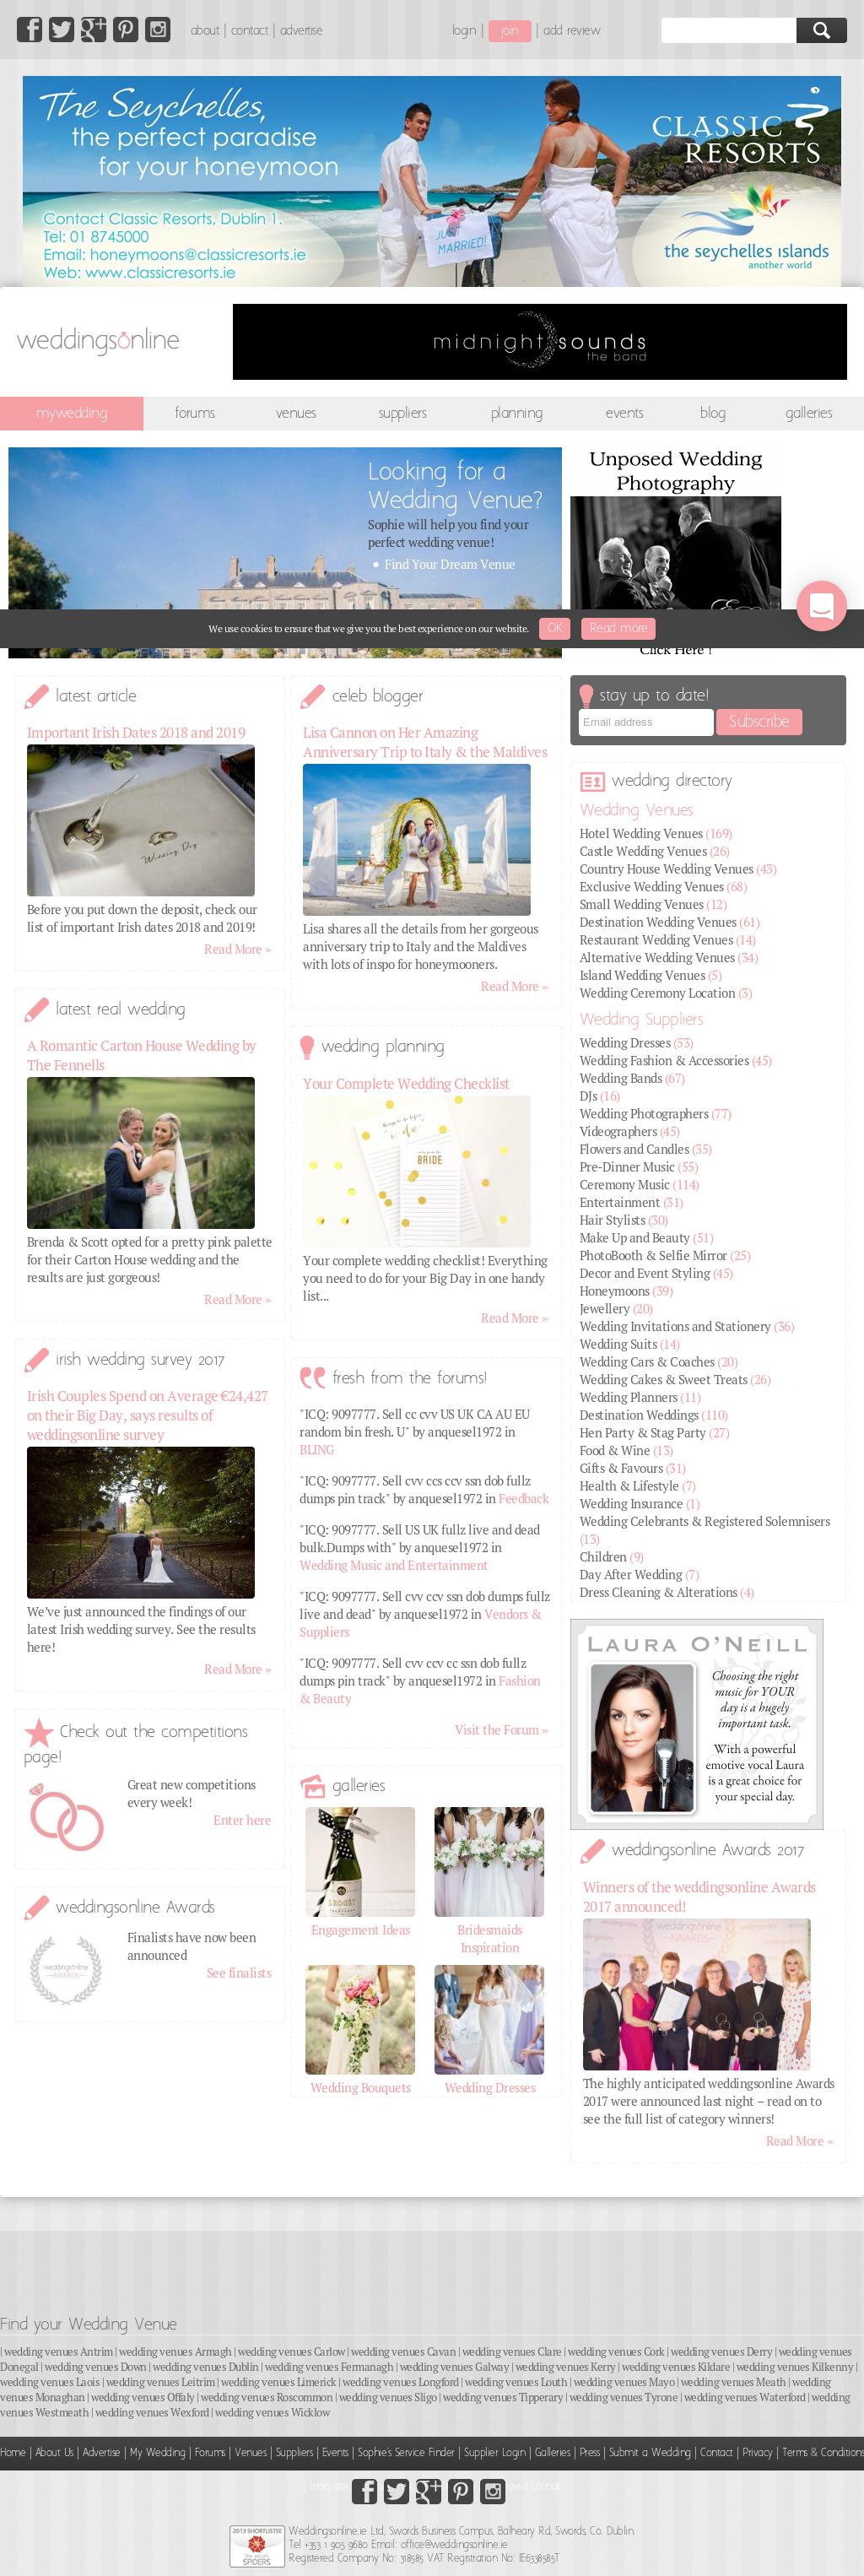 Weddingsonline Competitors, Revenue and Employees - Owler Company